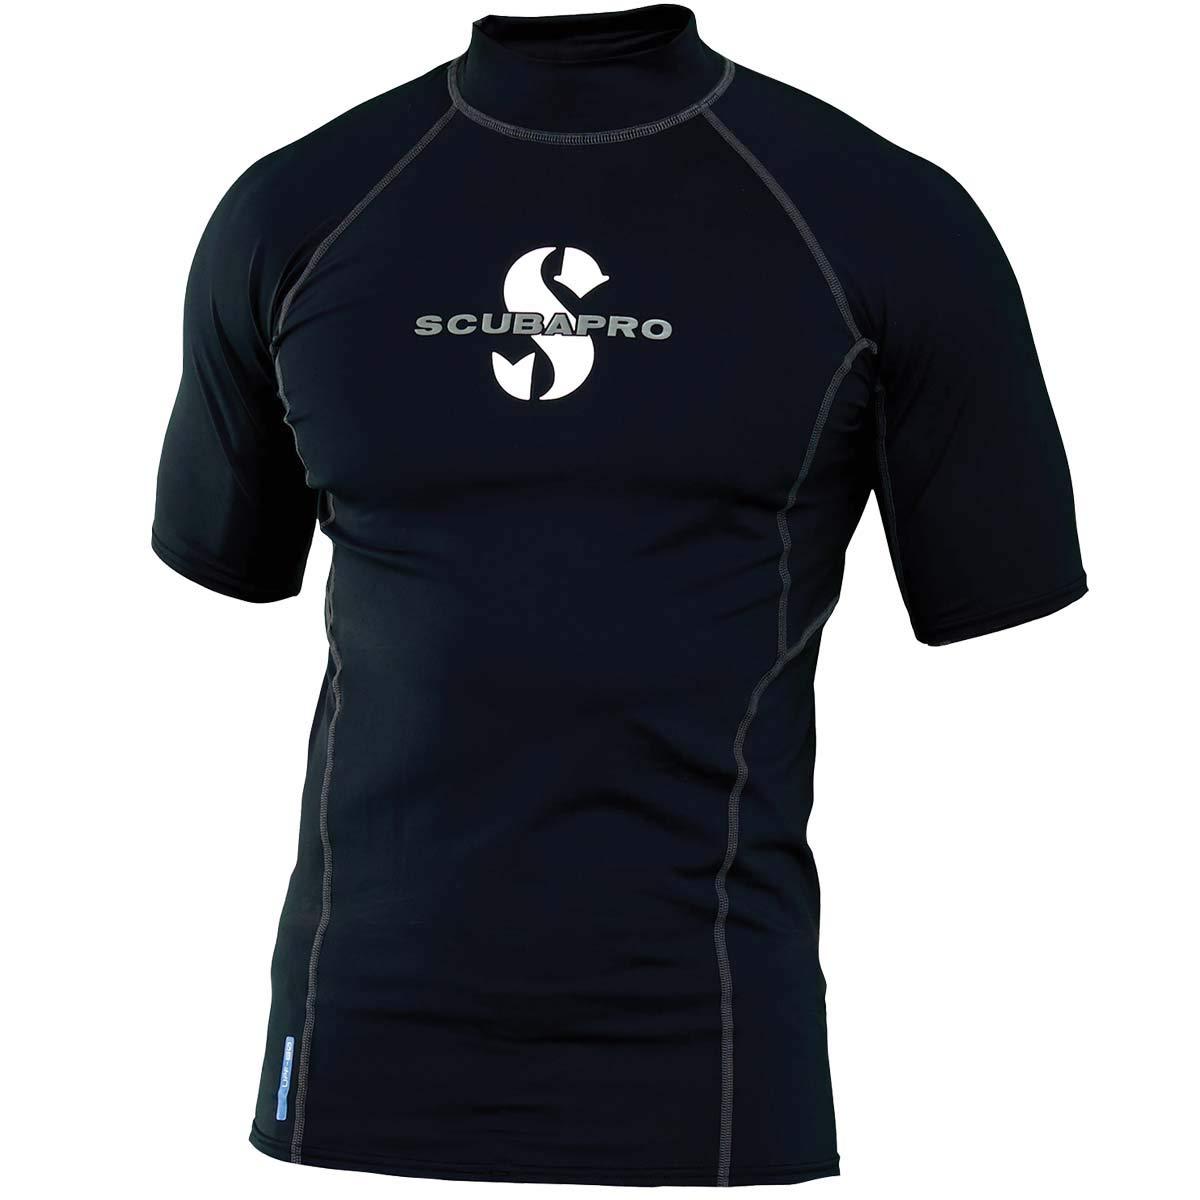 ScubaPro Men's UPF 80 T-Flex Short Sleeve Rash Guard, Black, Size: Small